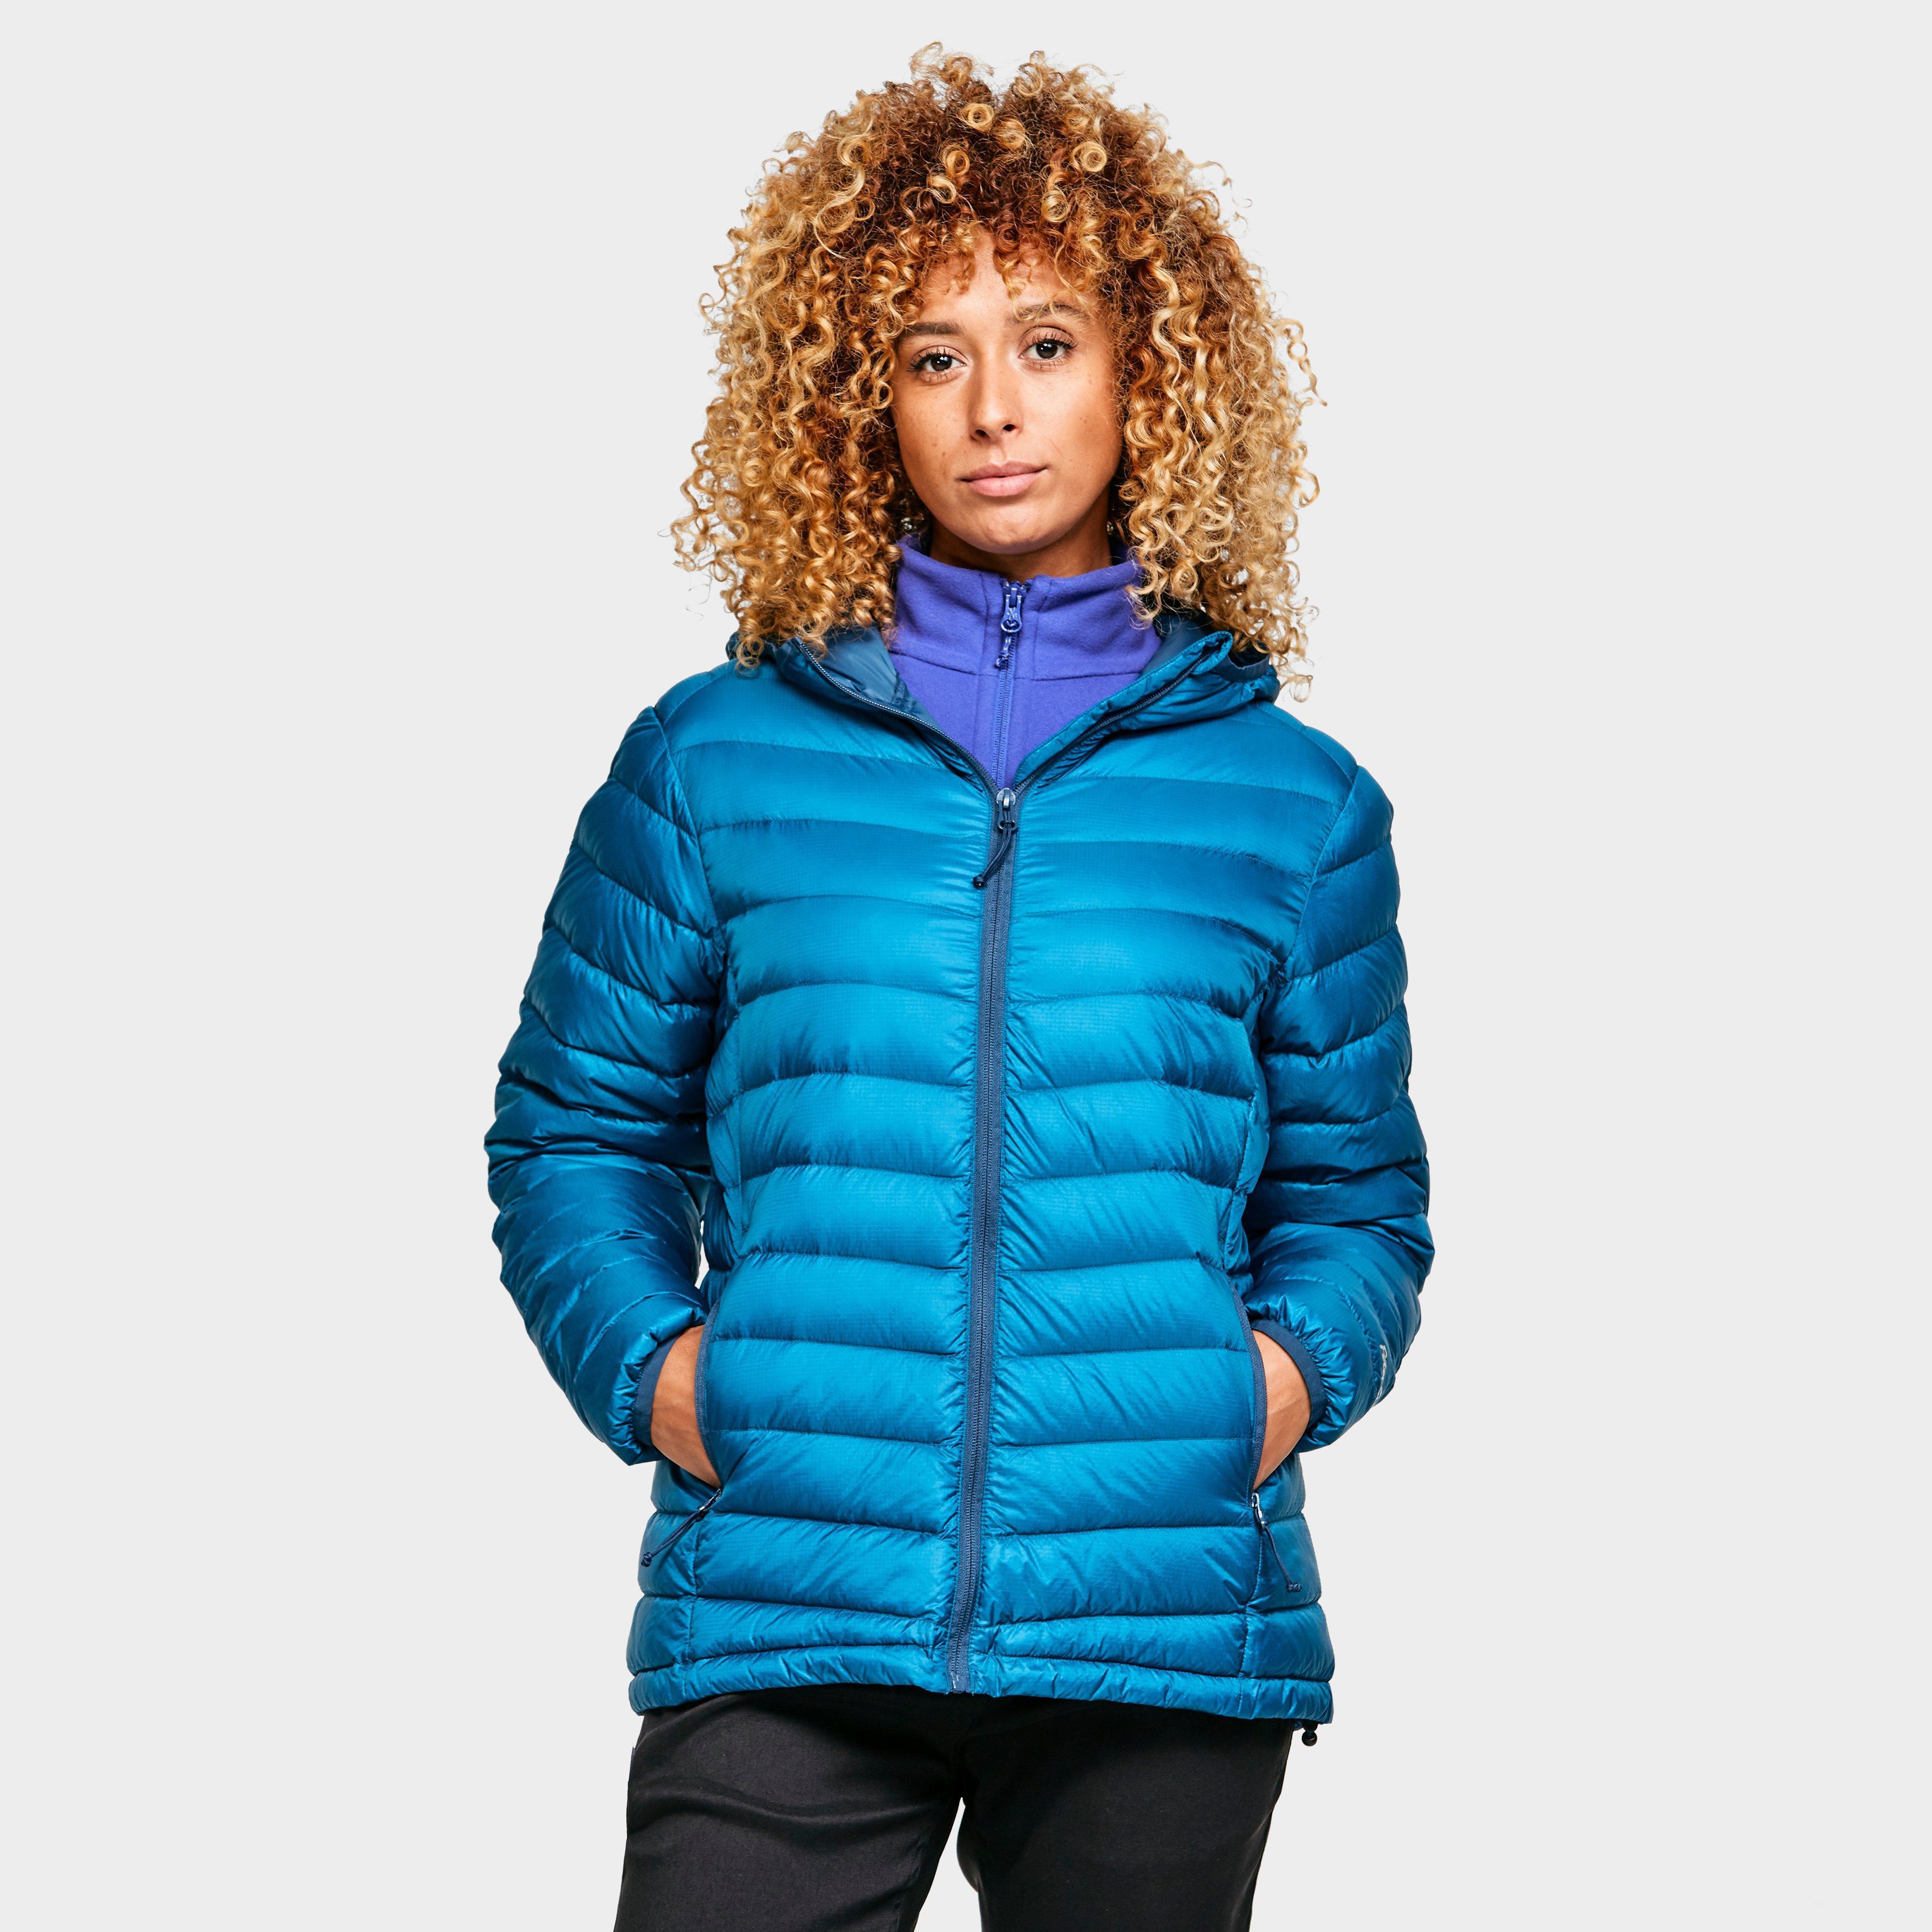 Peter Storm Womens Packlite Alpinist Jacket - Blue/mbl  Blue/mbl